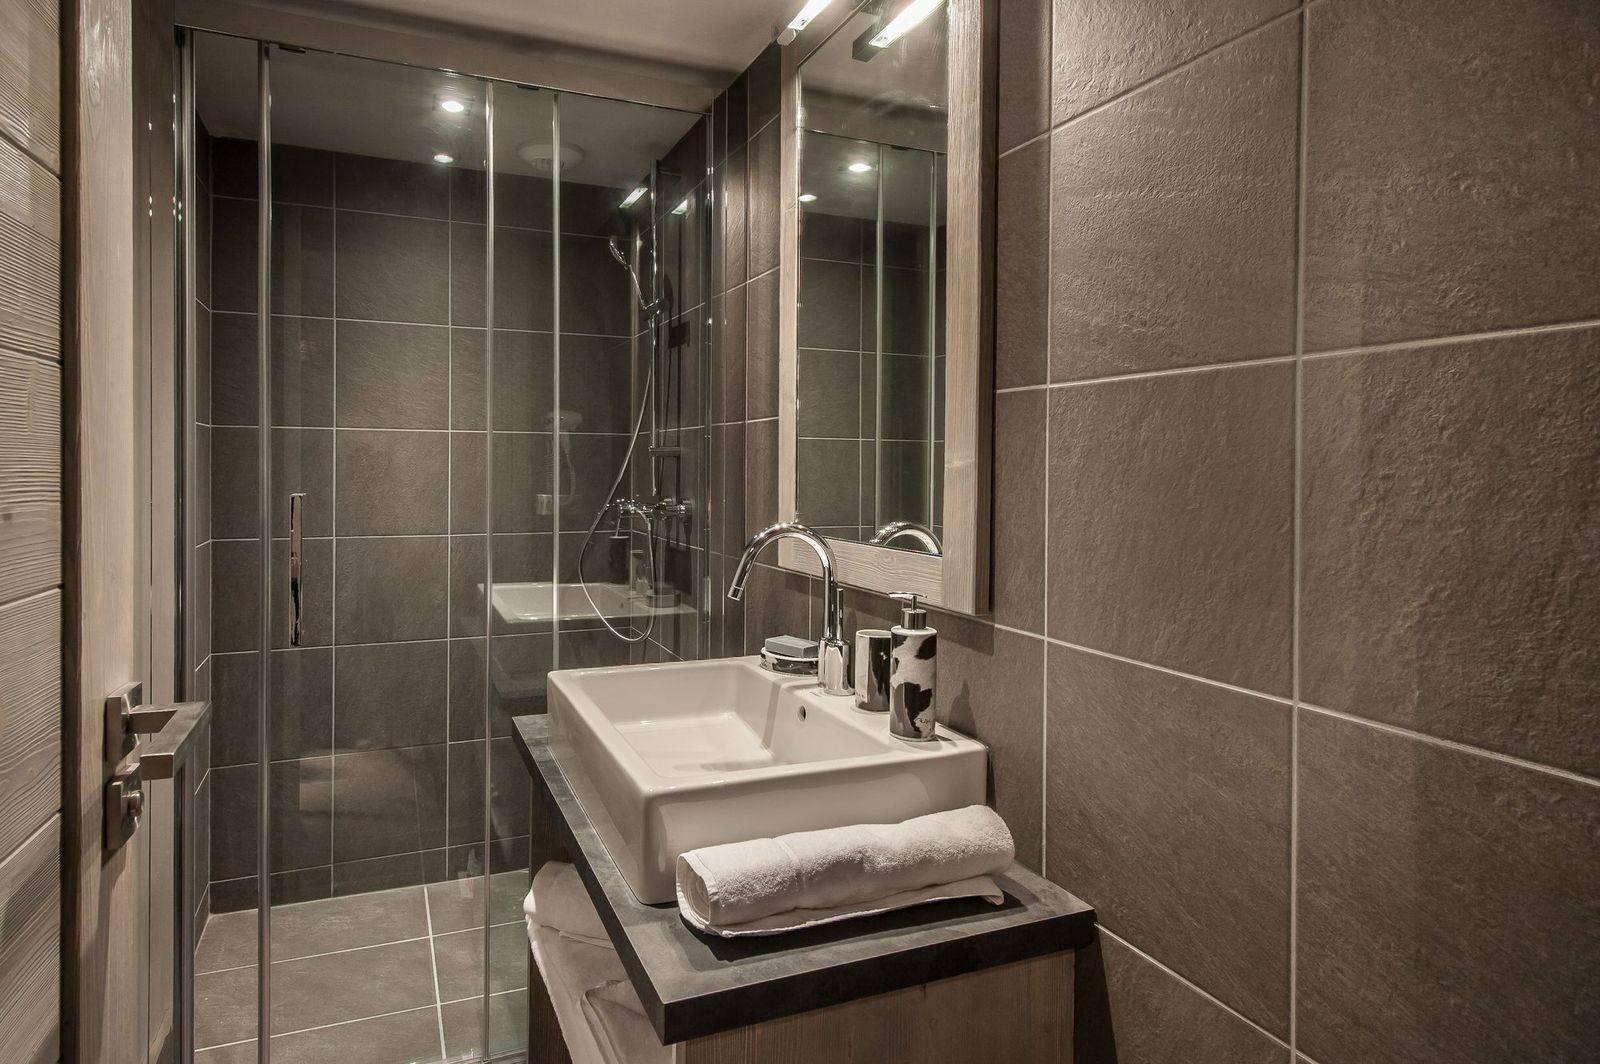 Courchevel 1650 Luxury Rental Appartment Dracali Bathroom 2